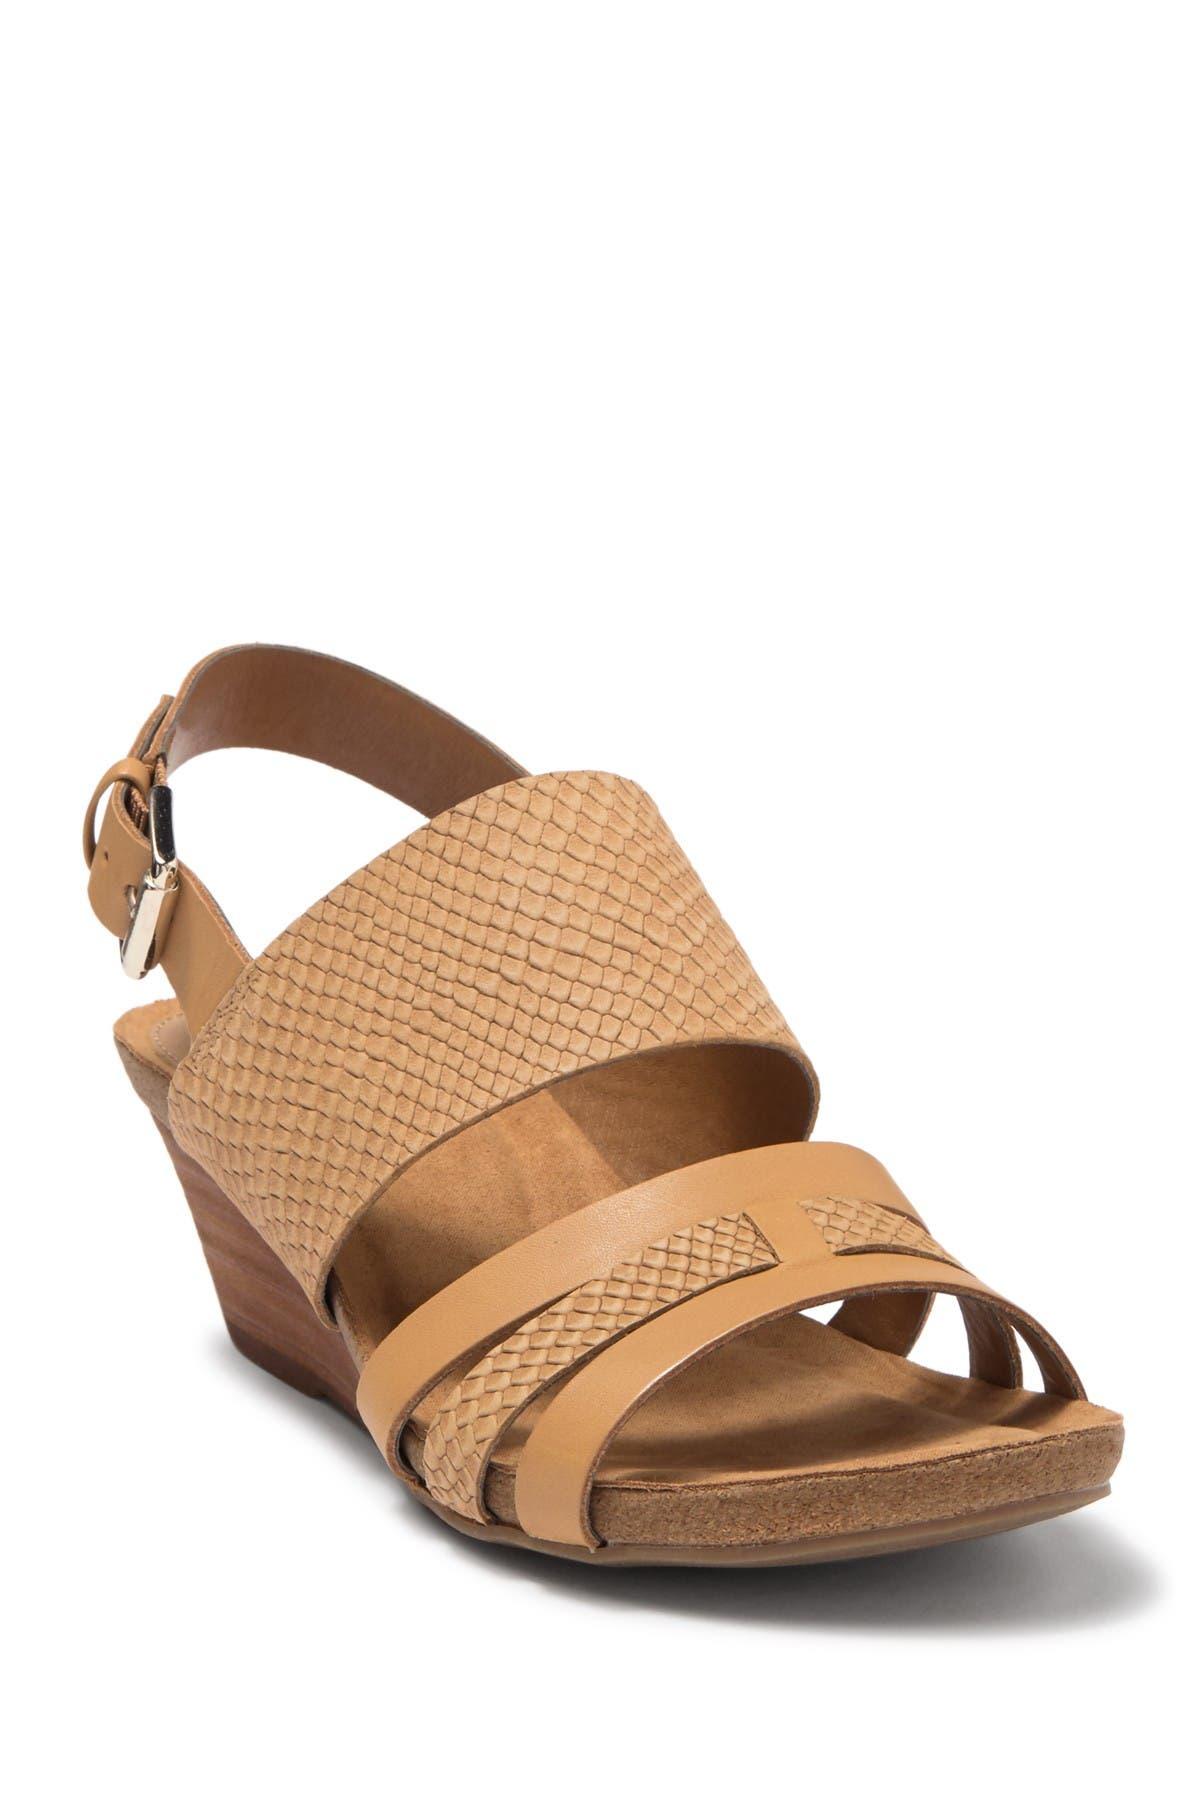 Image of Sofft Velora Snakeskin Embossed Wedge Sandal